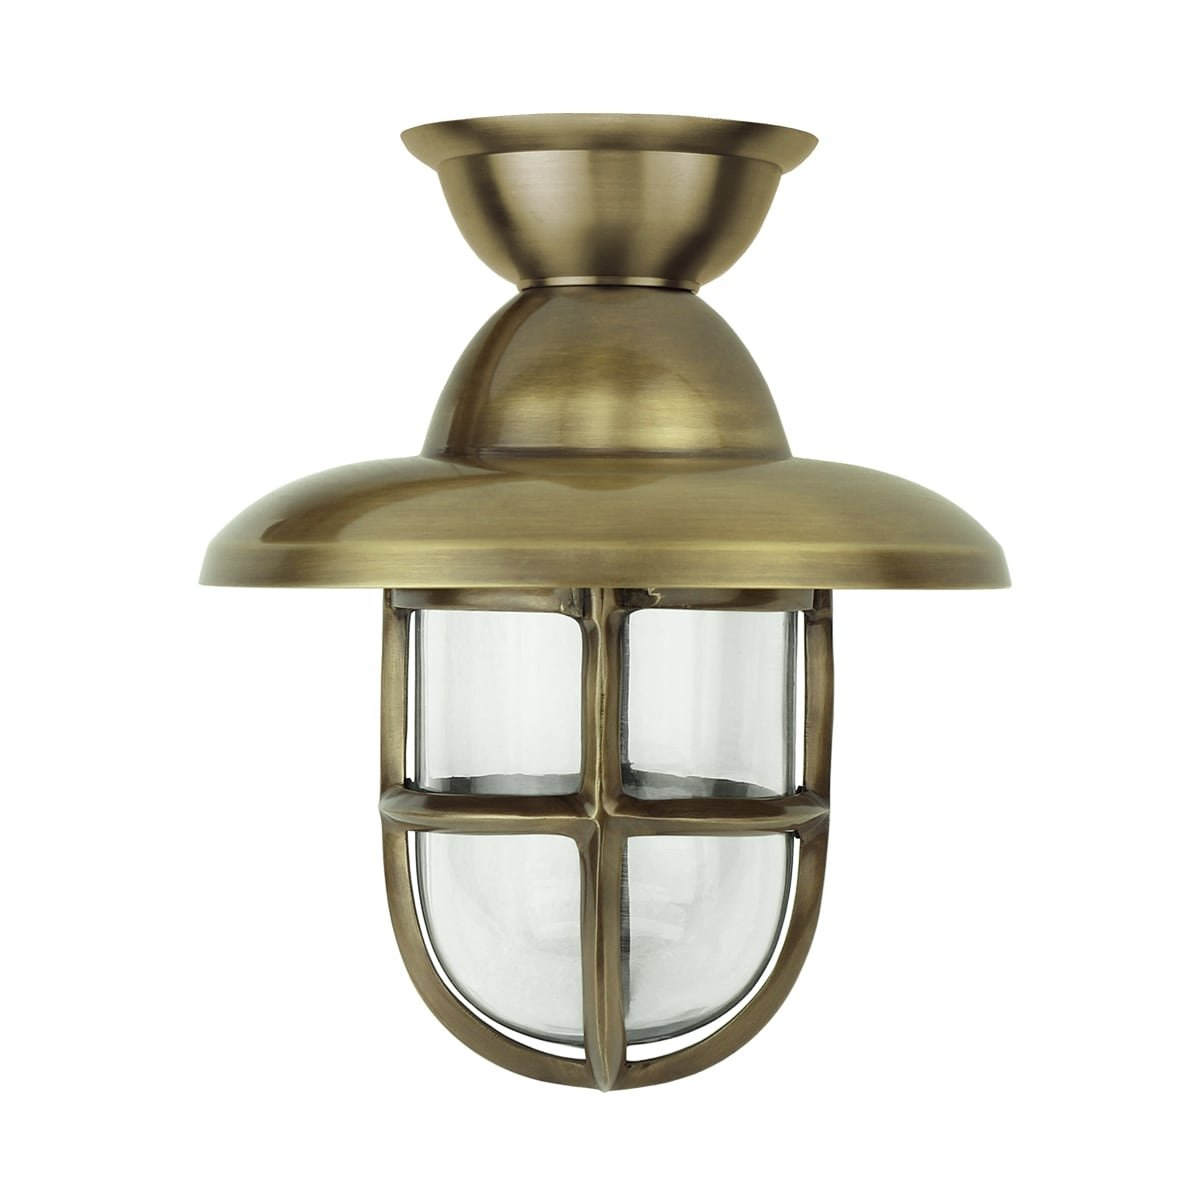 Outdoor lighting Maritime nautical Ship lamp Marine brass - 32 cm